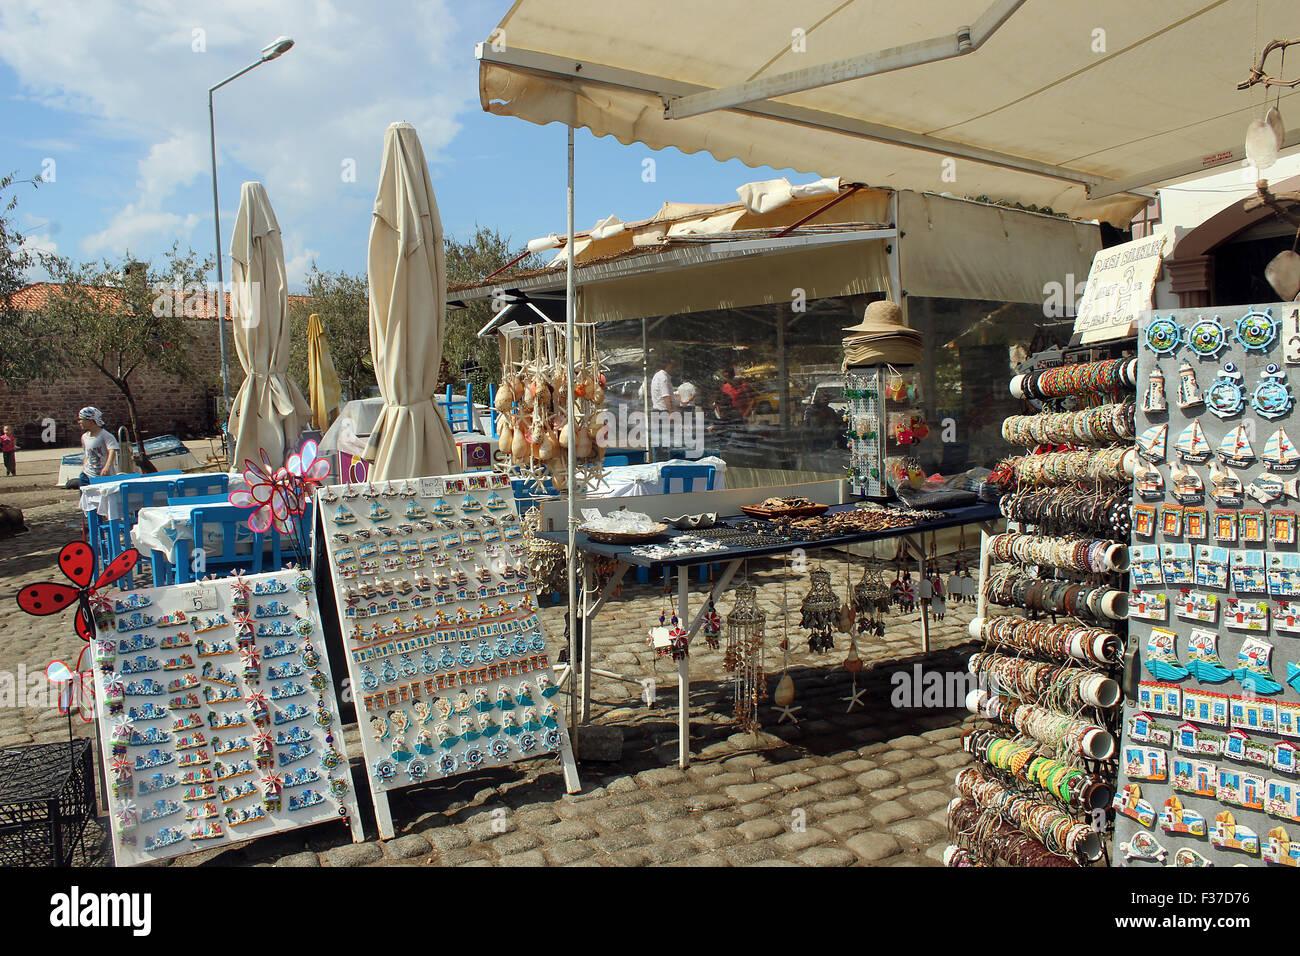 Cunda Island, Balikesir, Turkey - September 24, 2015: Souvenirs for sale displayed at gift shop, Turkey - Stock Image